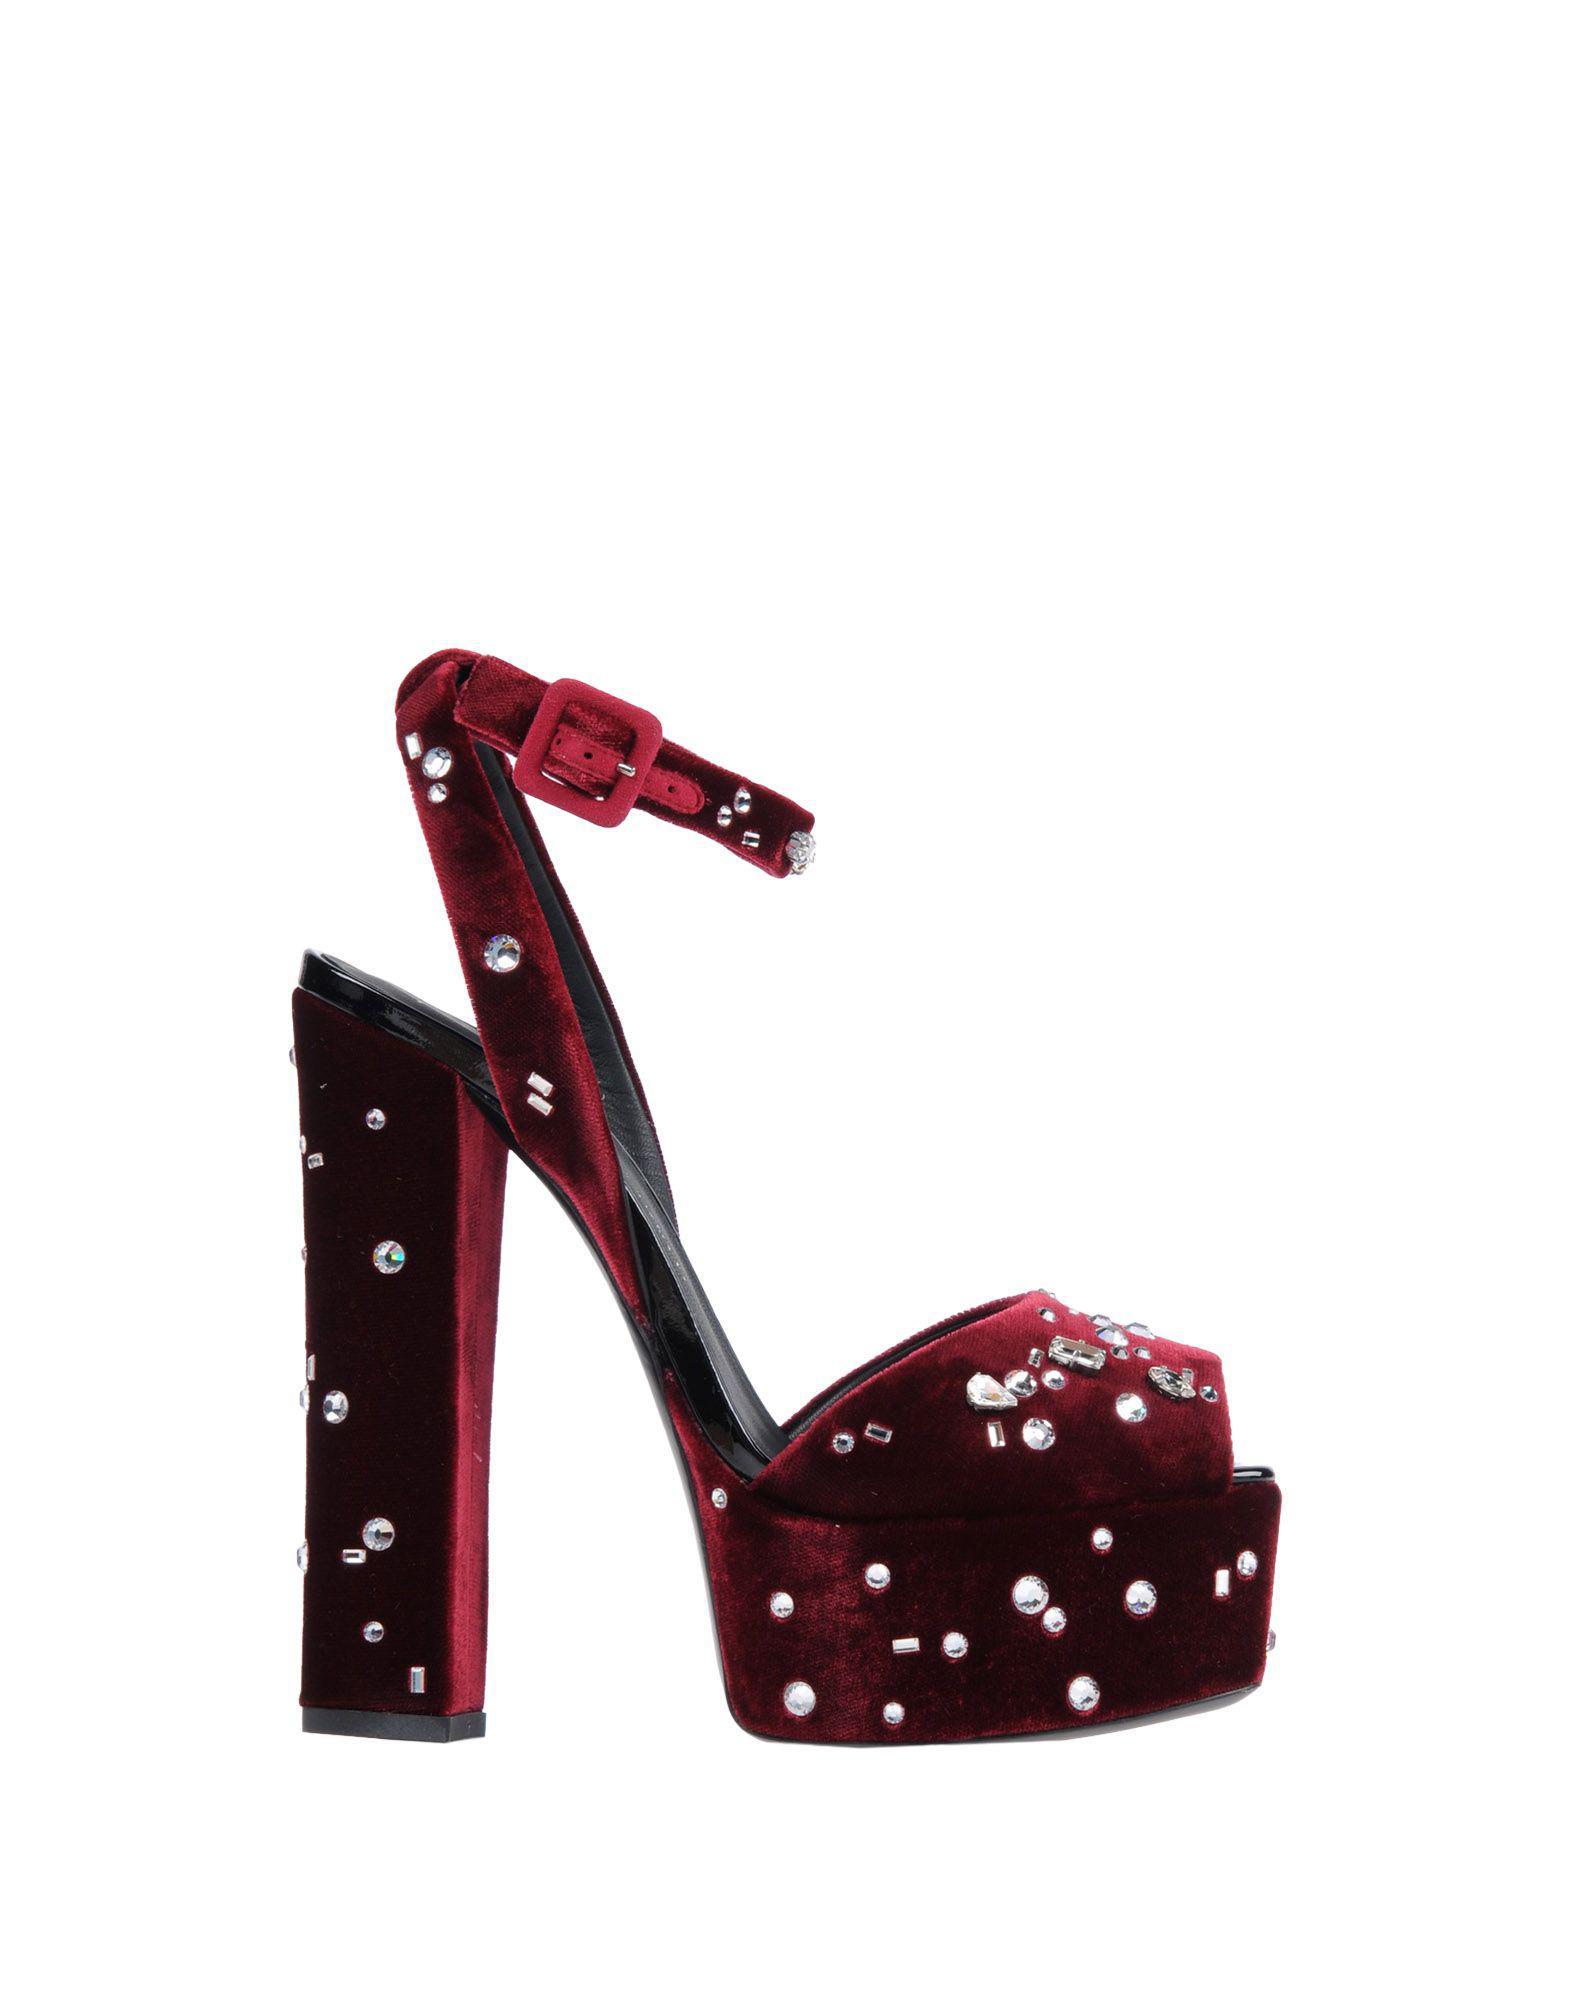 c1da4e4e68e Lyst - Giuseppe Zanotti Lavinia Swarovski Crystal Platform Sandals - Save  50%